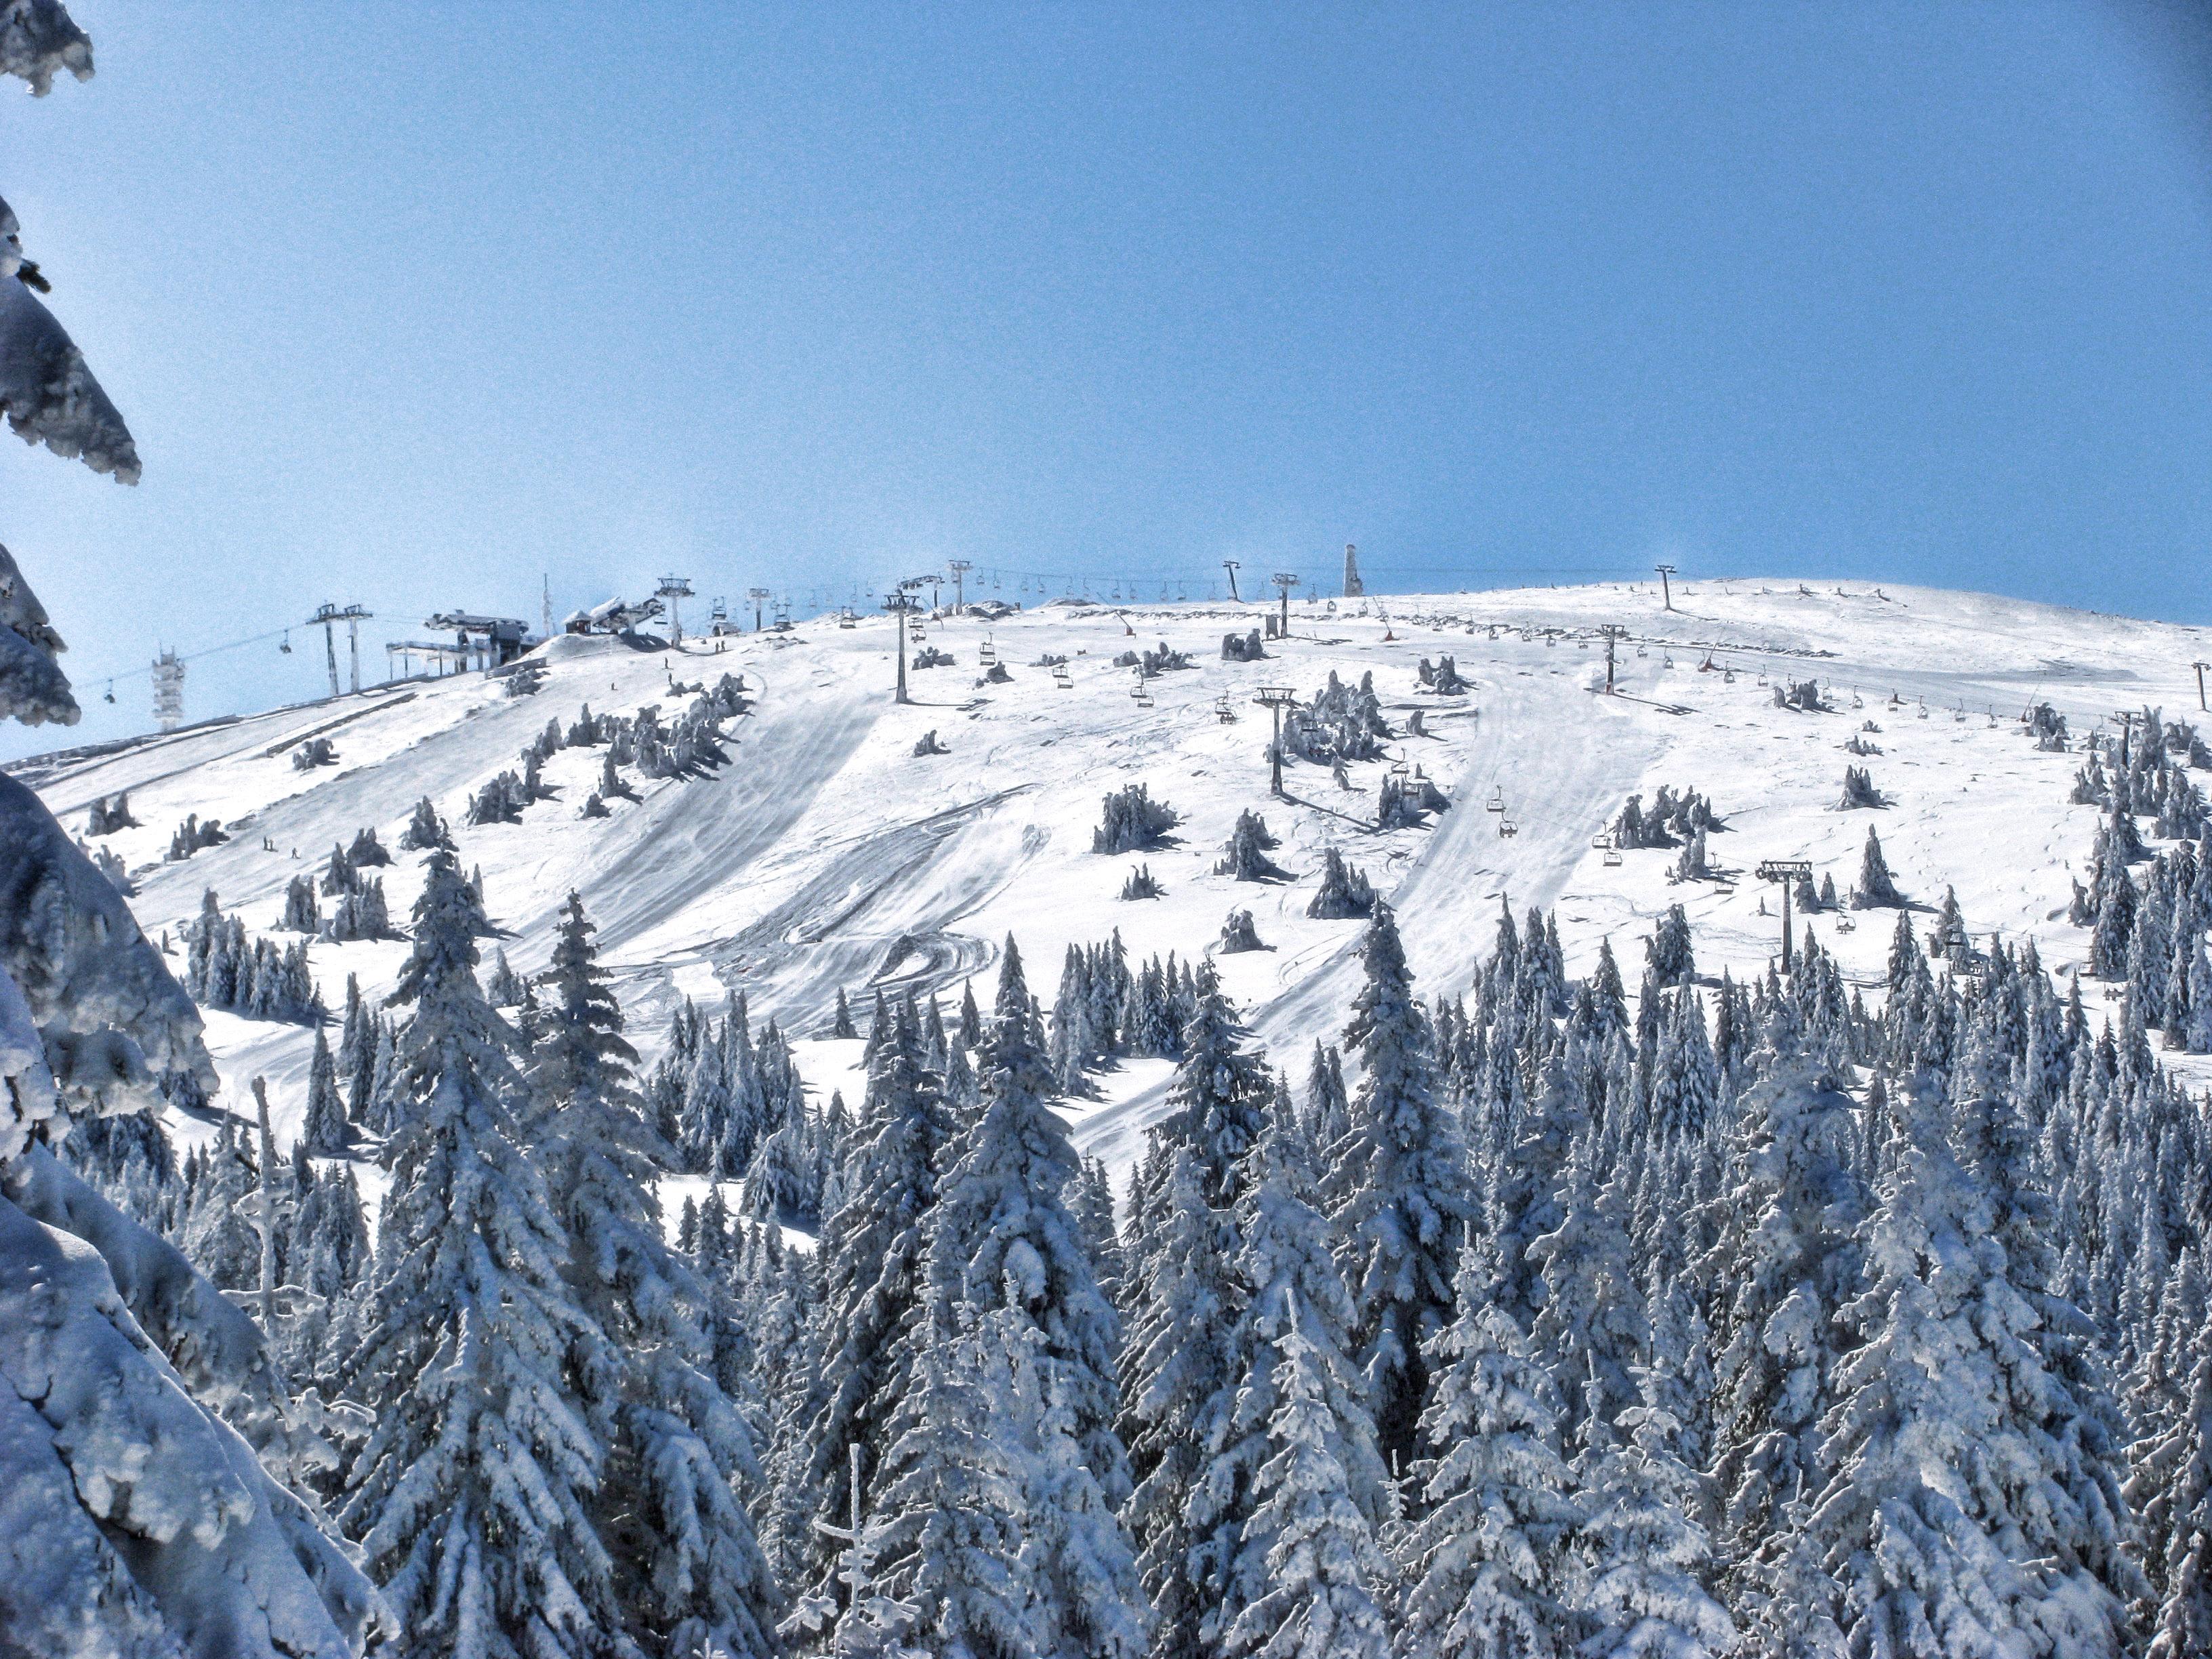 https://i2.wp.com/upload.wikimedia.org/wikipedia/commons/4/4c/Pan%C4%8Di%C4%87ev_vrh_during_winter.jpg